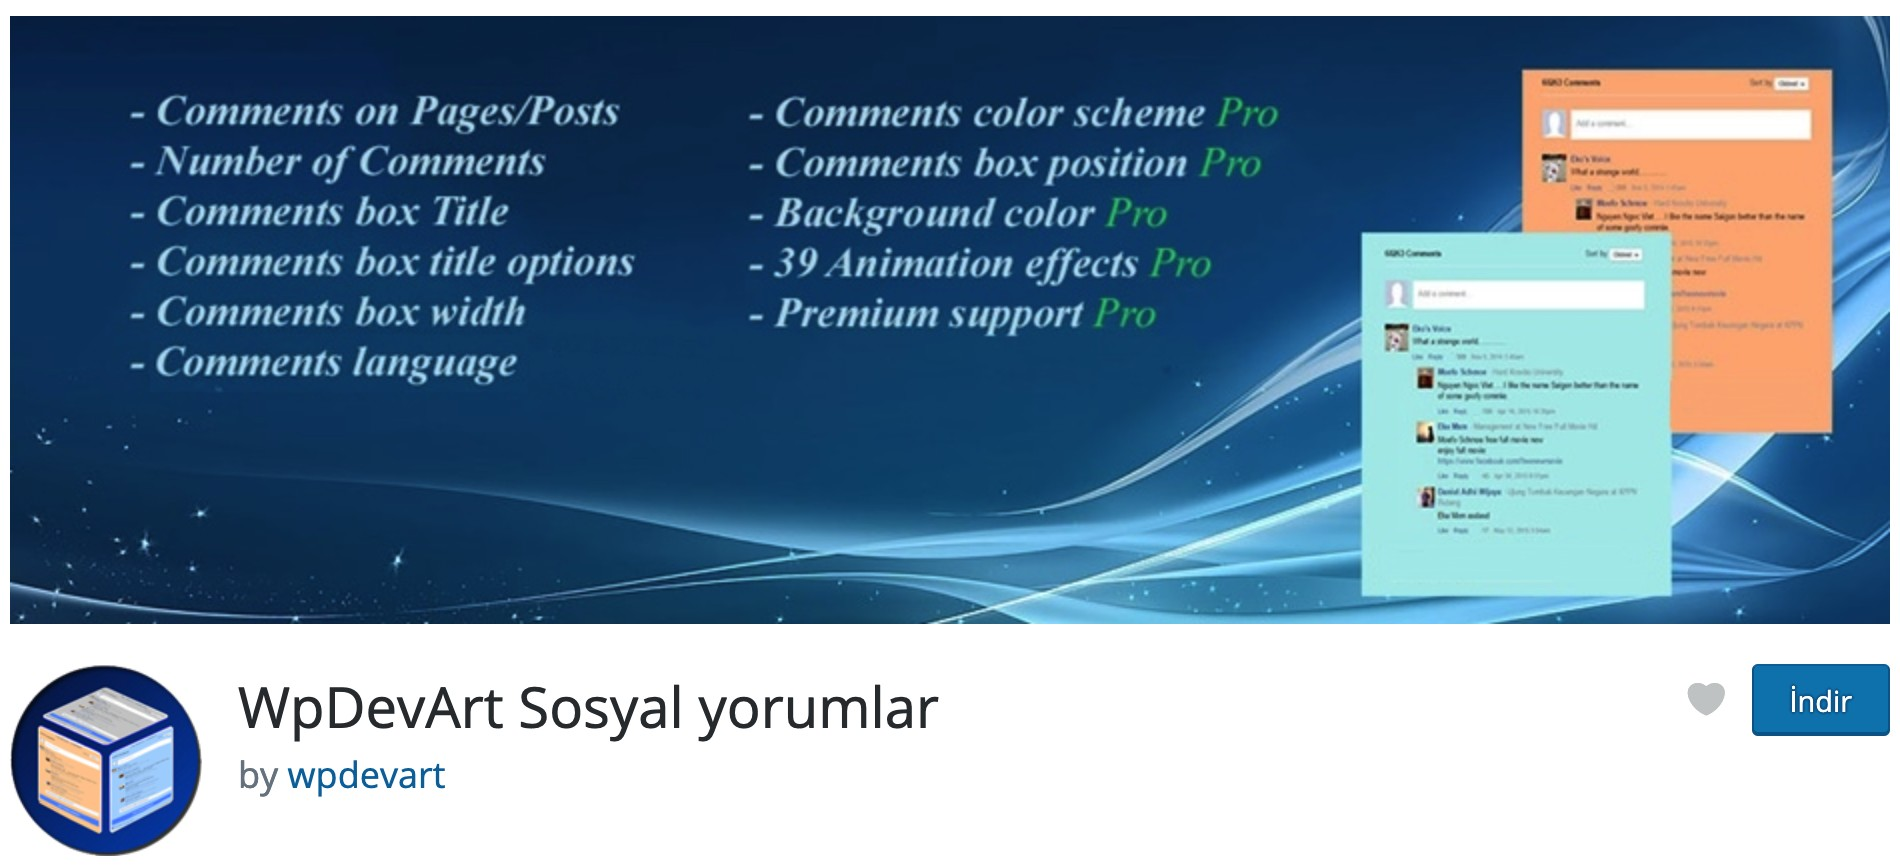 WordPress Sosyal Yorumlar